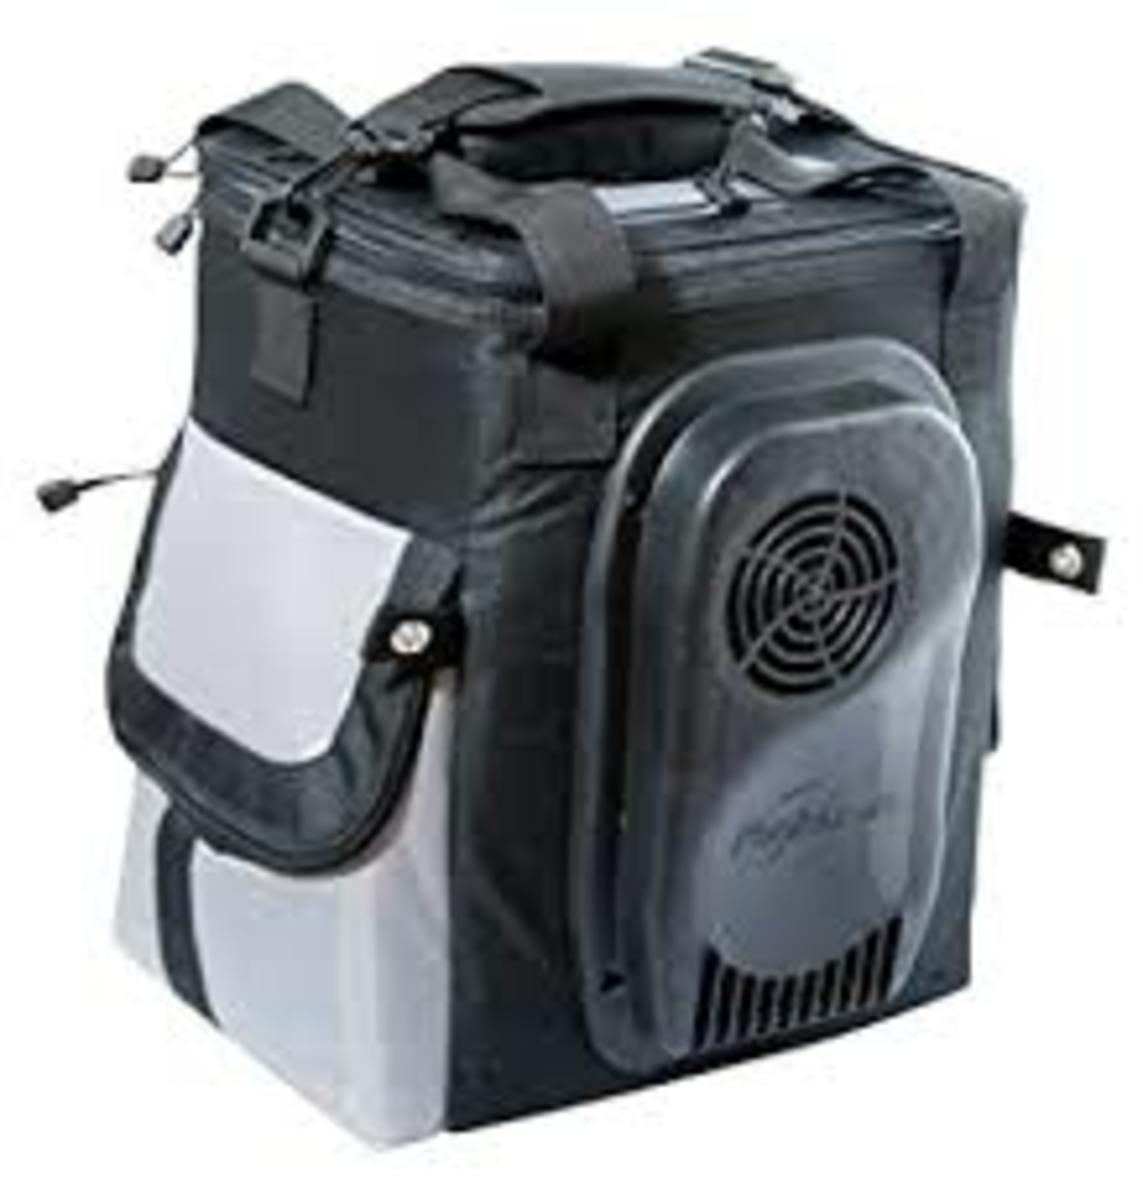 Koolatron 14-Quart Electric Cooler